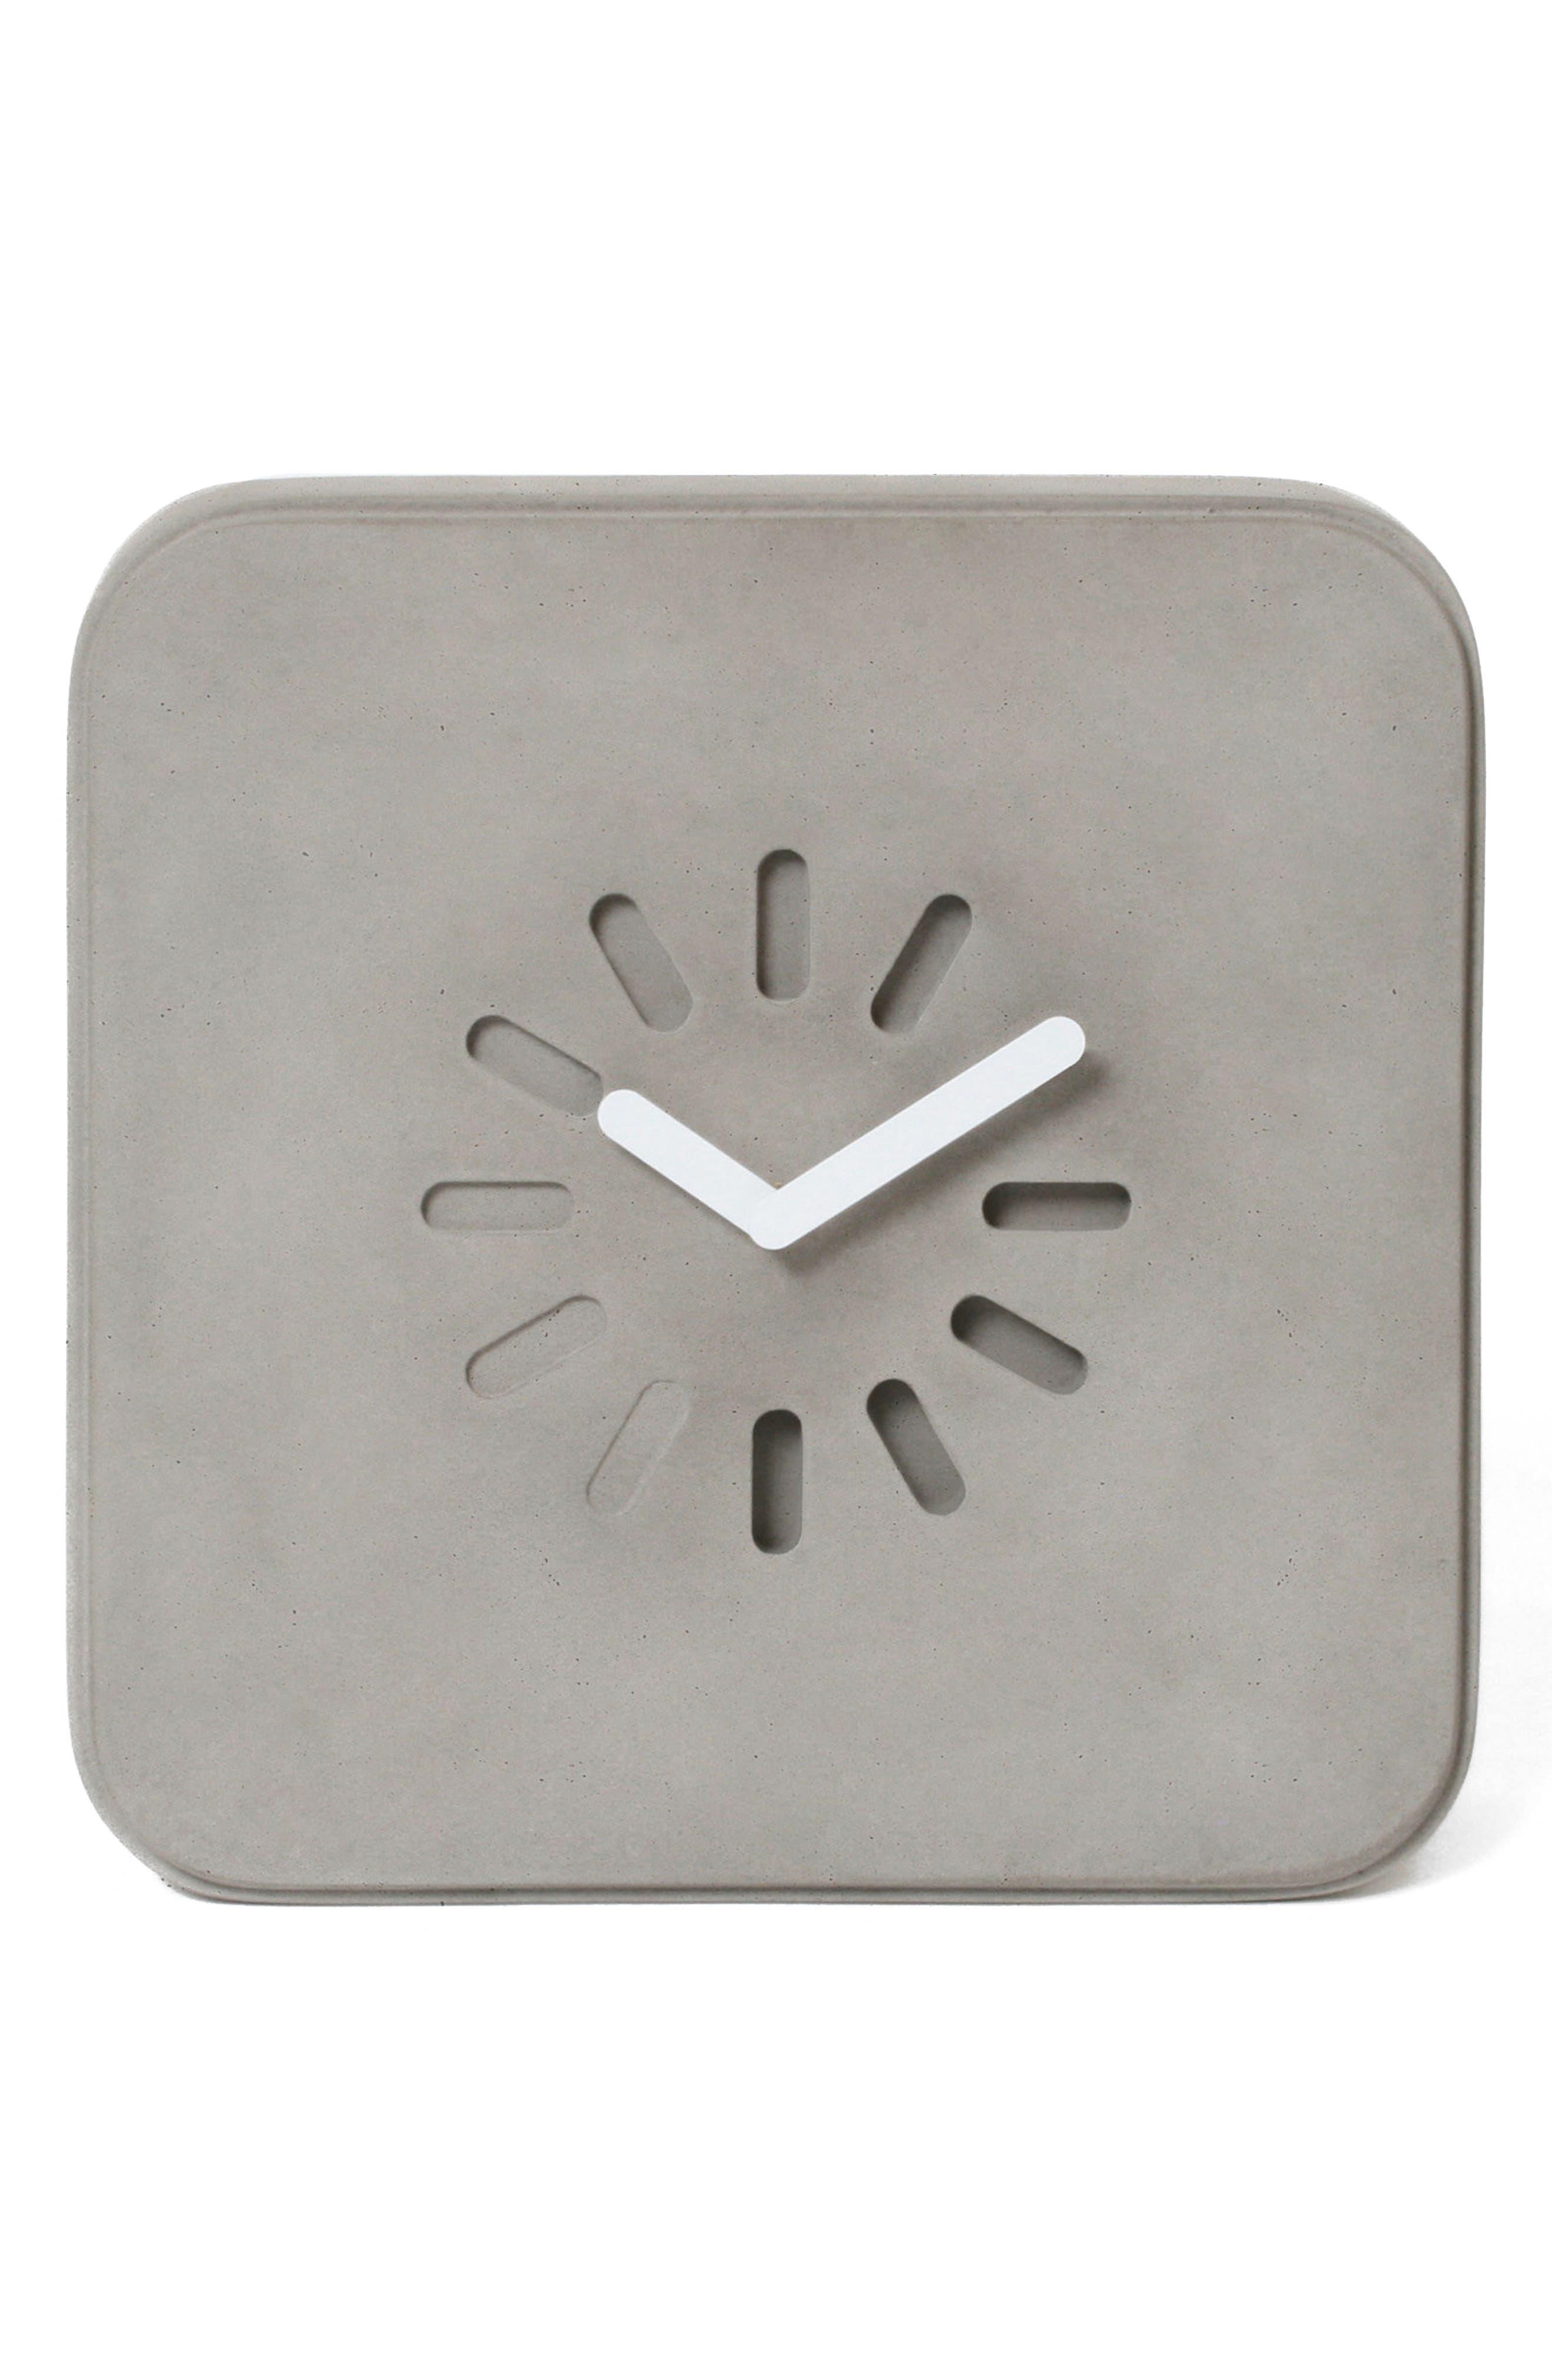 Lyon Béton Life in Progress Clock,                             Main thumbnail 1, color,                             Cement